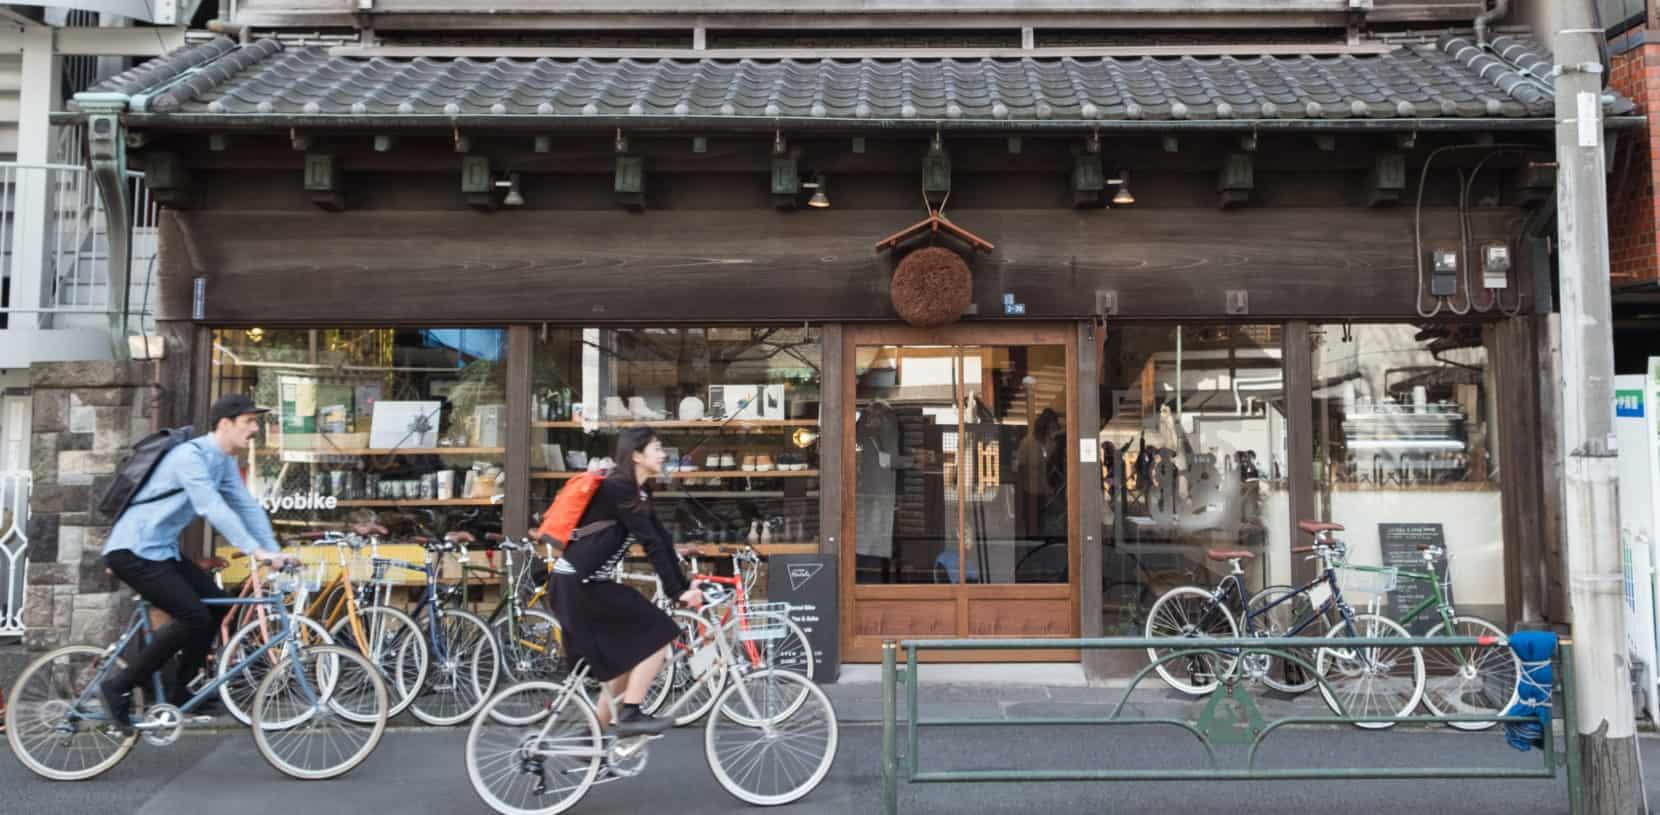 tokyobikeトーキョーバイクtokyobikerentalsレンタルバイク谷中yanakaトップ画像